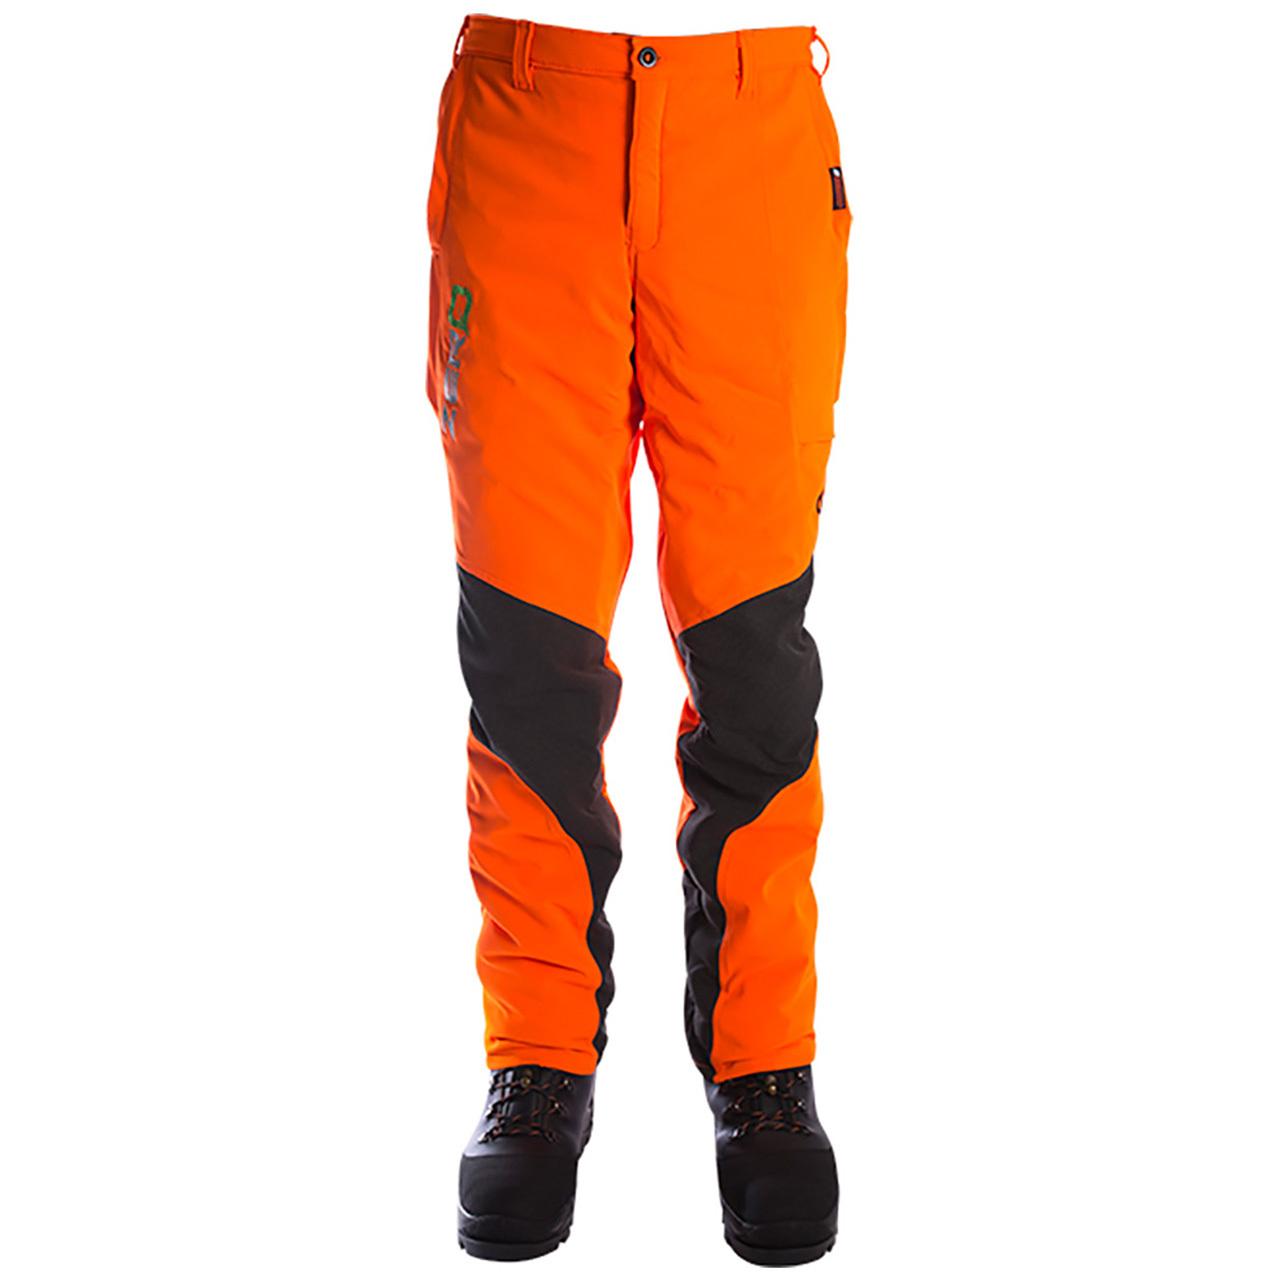 Clogger Zero Gen2 Light & Cool Women's Chainsaw Pants - Hi Vis Orange